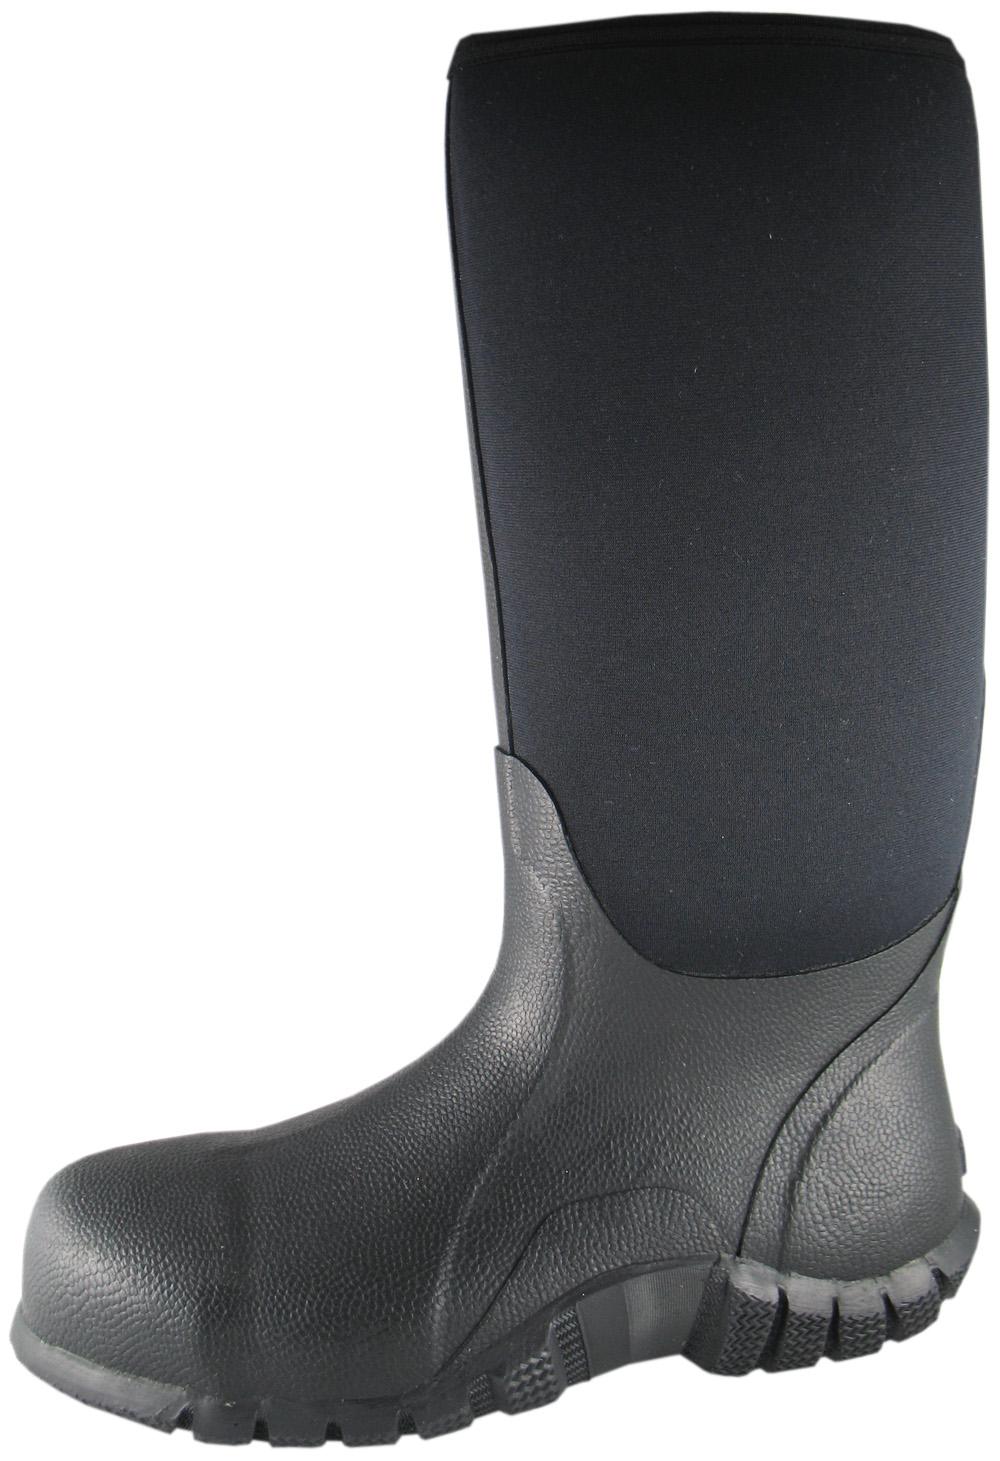 Smoky Mountain Mens Smoky Mountain Safety Amphibian Waterproof Boot Steel-Toe Black Medium 4718